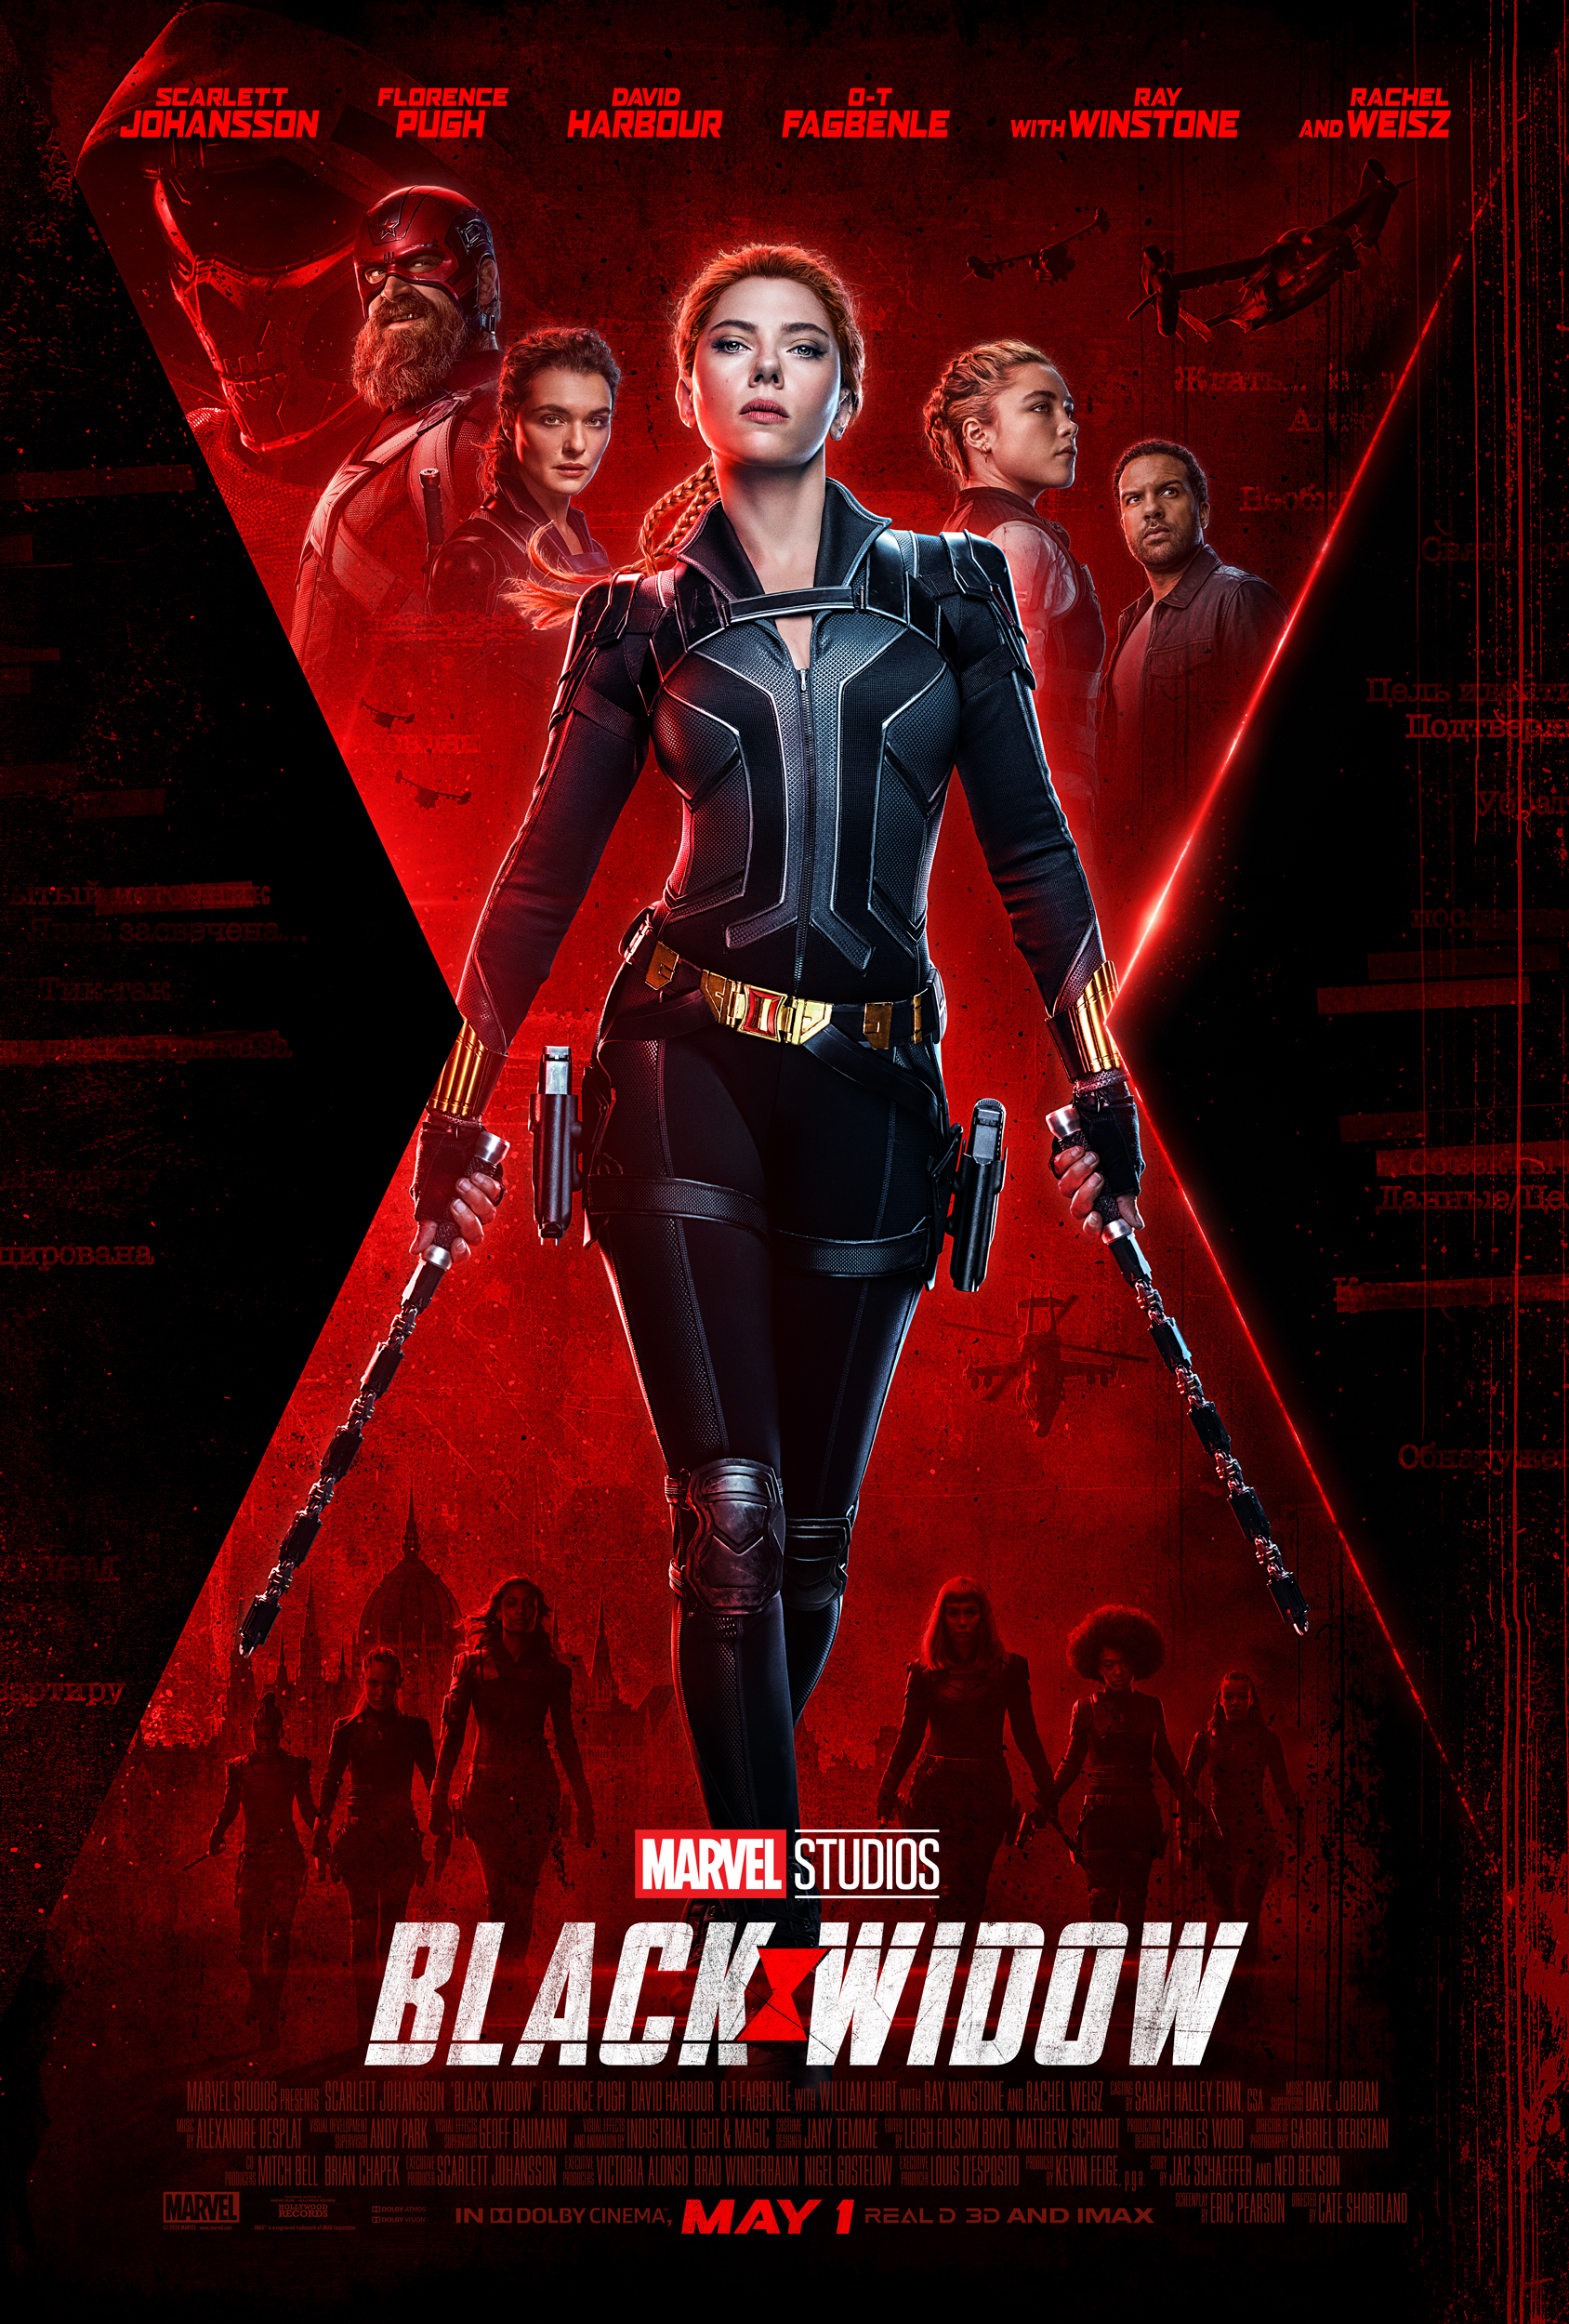 New Movie: Black Widow Starring Scarlett Johansson